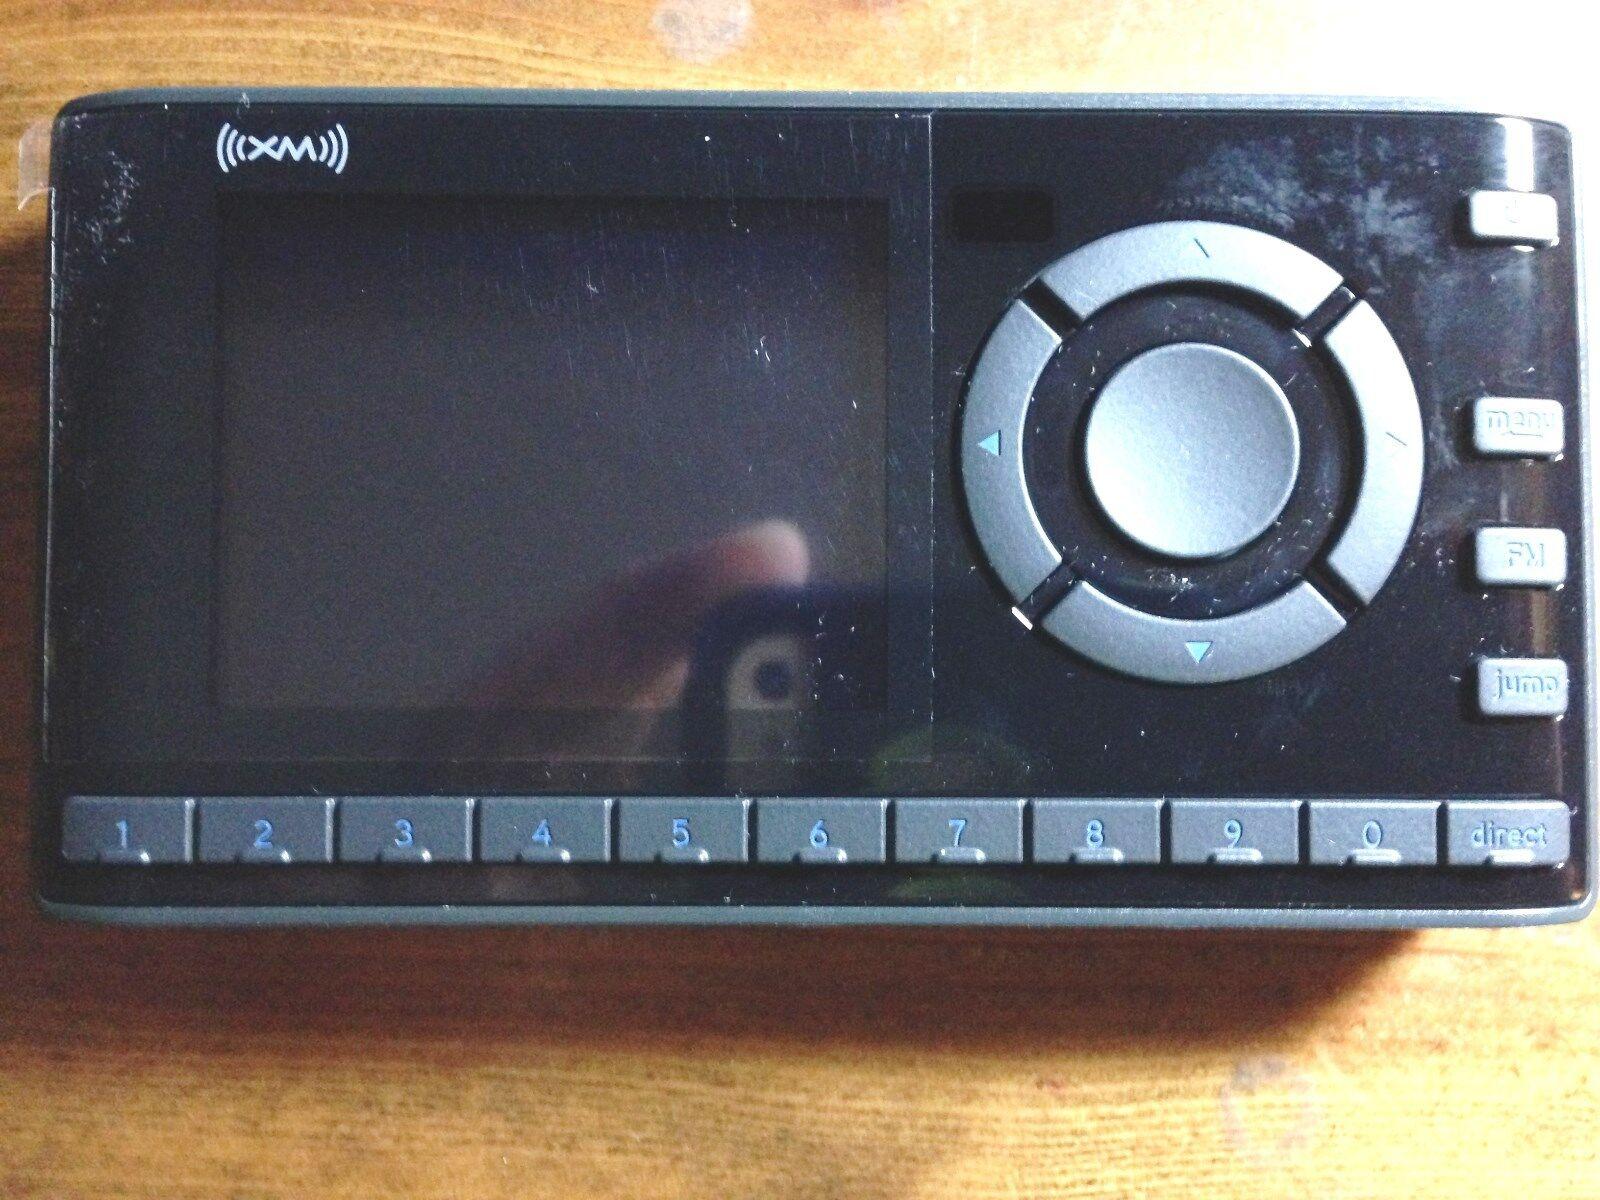 Xm Onyx Xdnx1v1 Radio Replacement